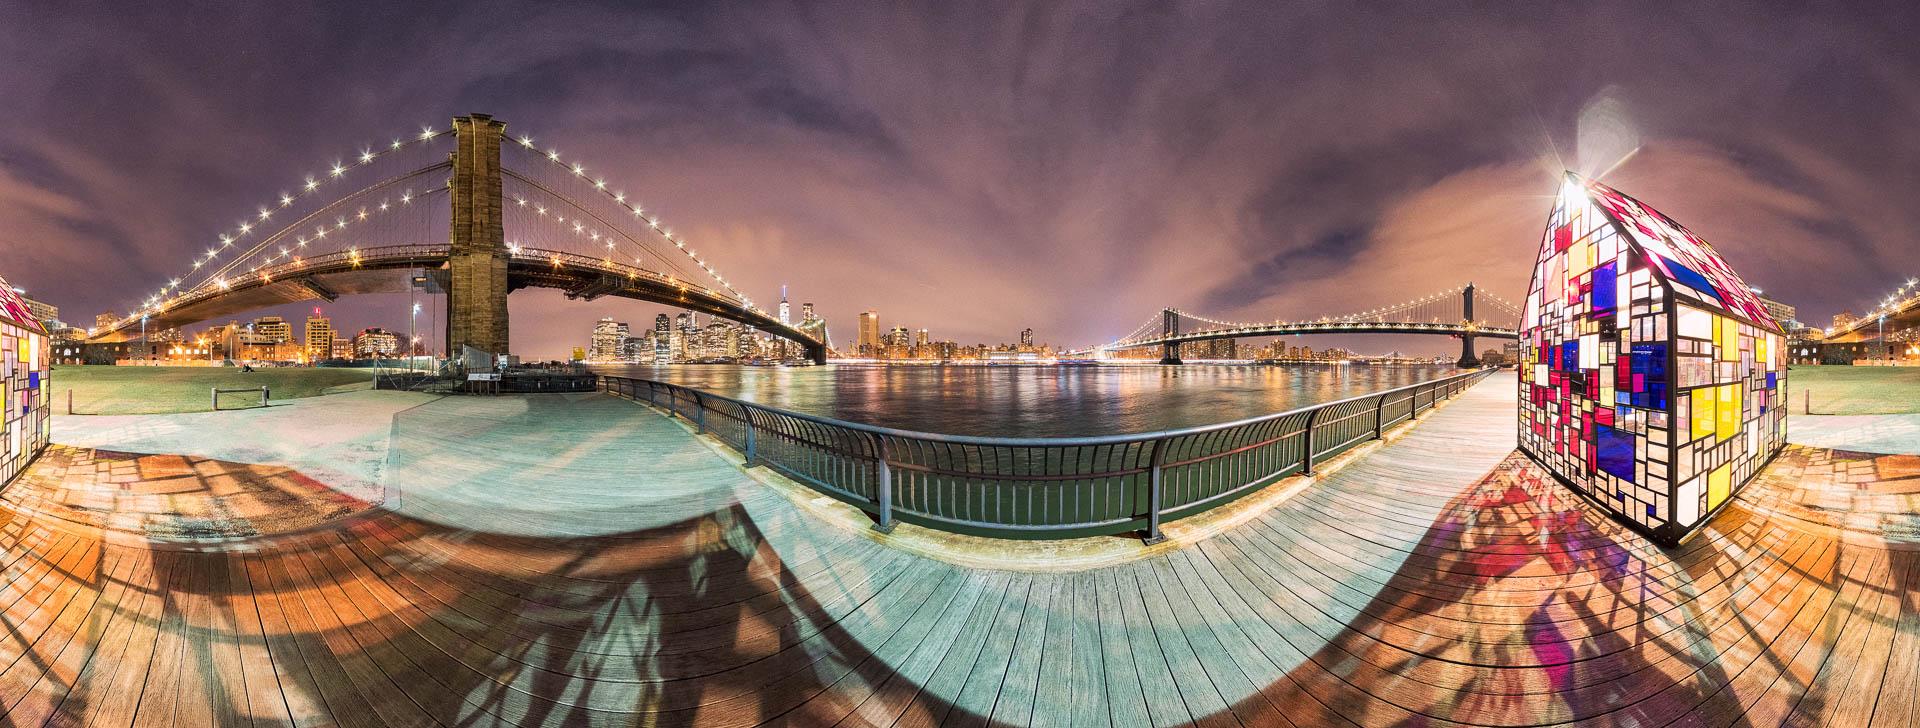 NYC DUMBO Glass House by Tobi Bohn Panorama 360 Fotograf